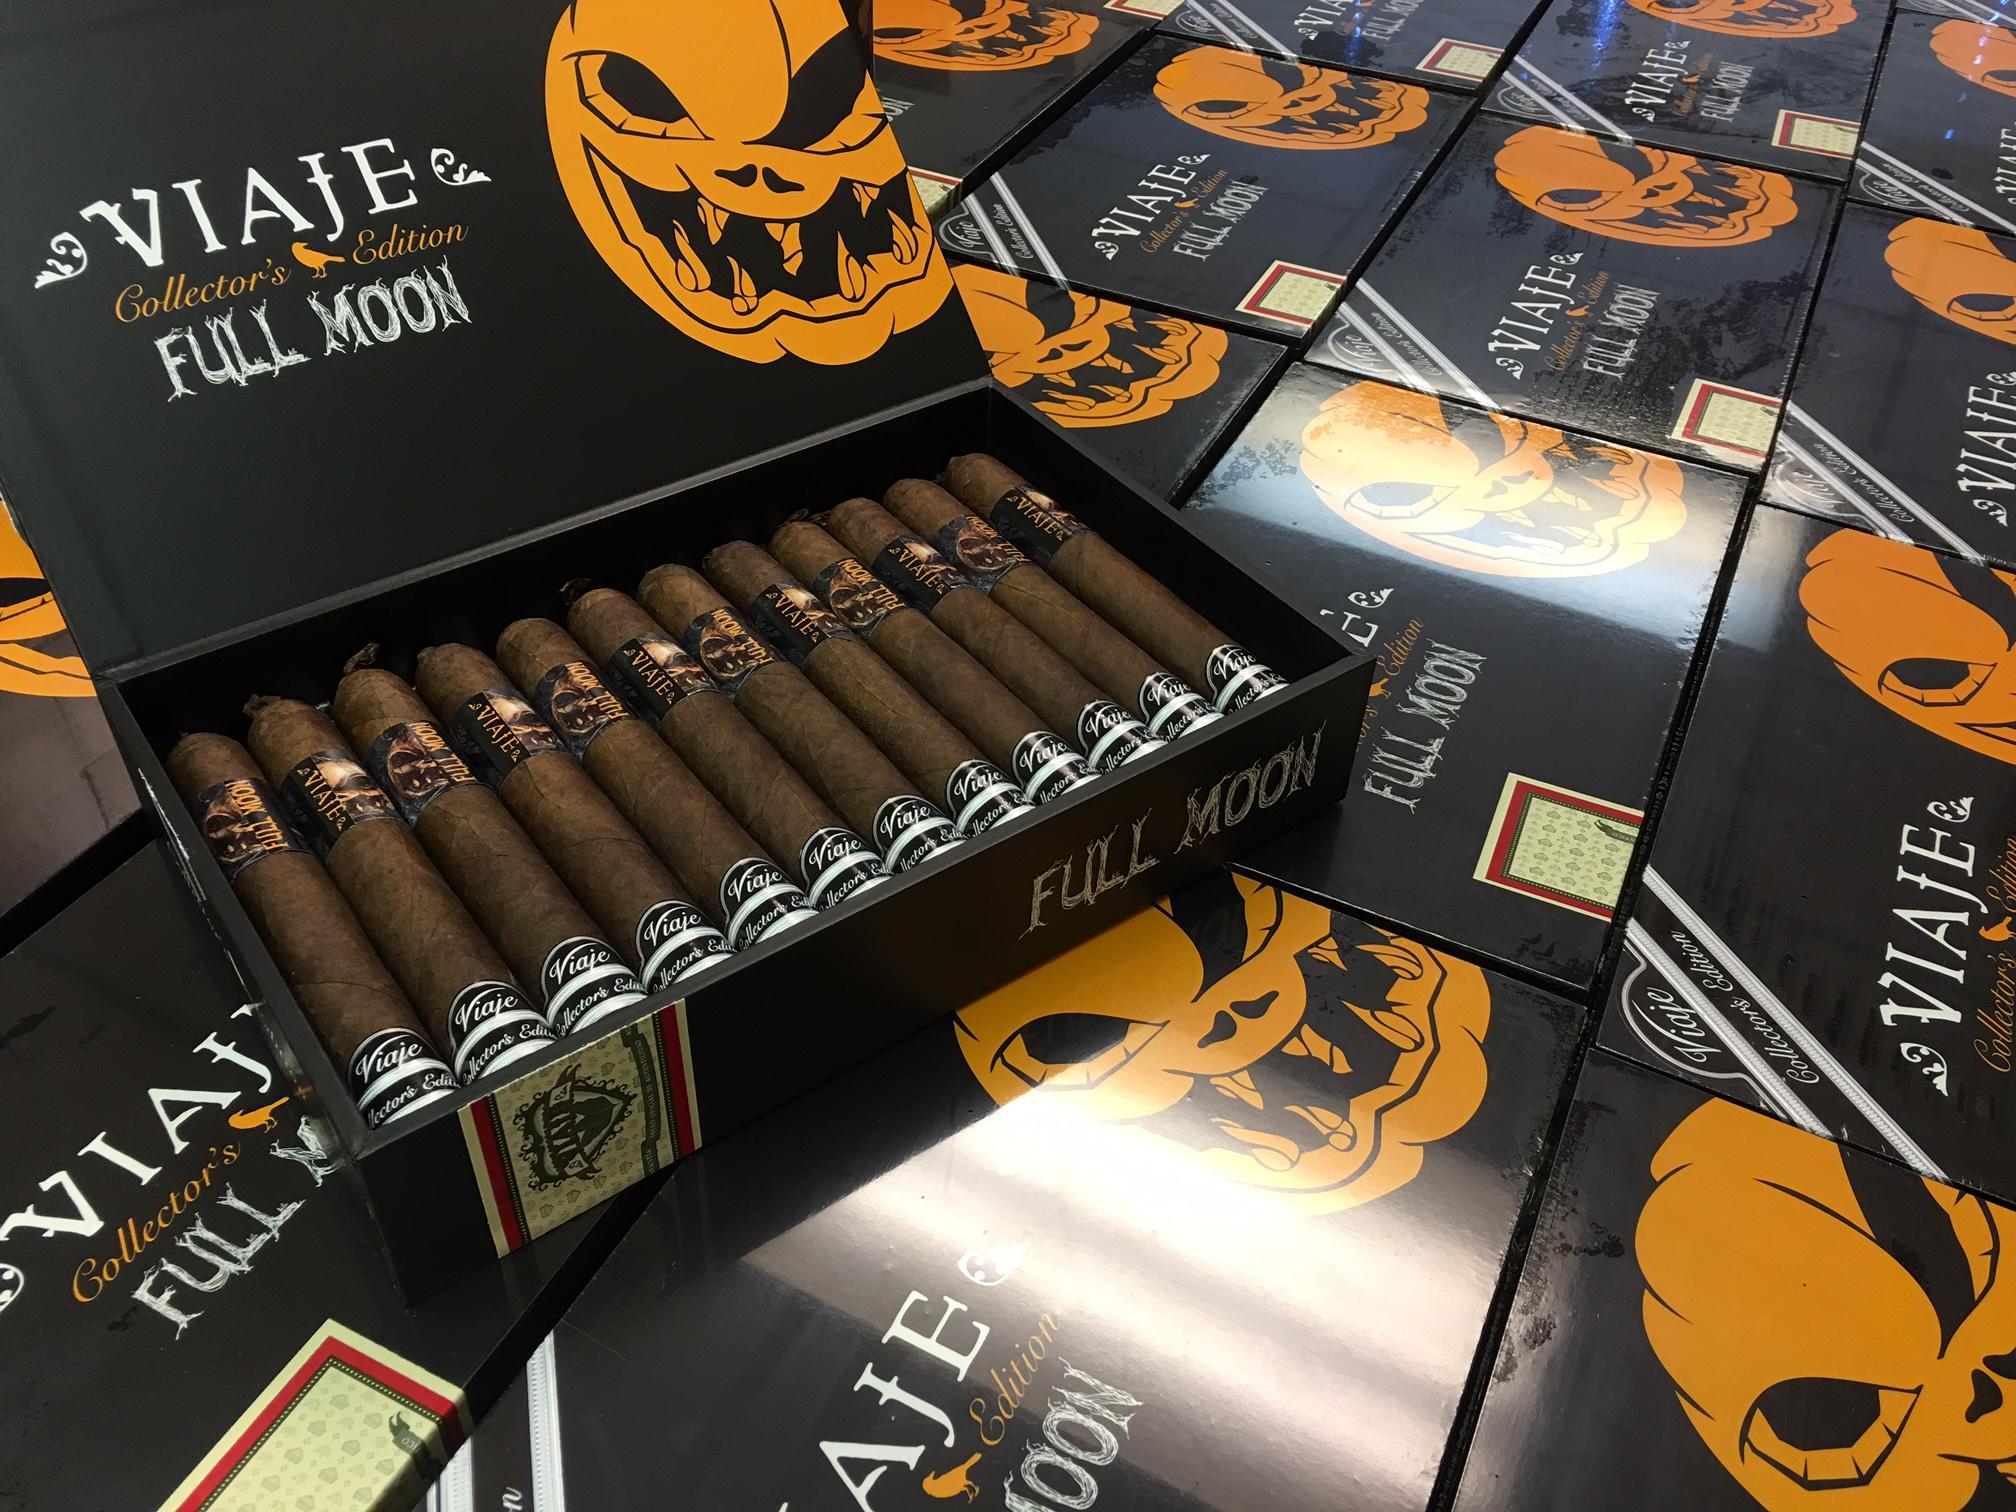 Cigar News: Viaje Full Moon Collector's Edition 2016 Slated